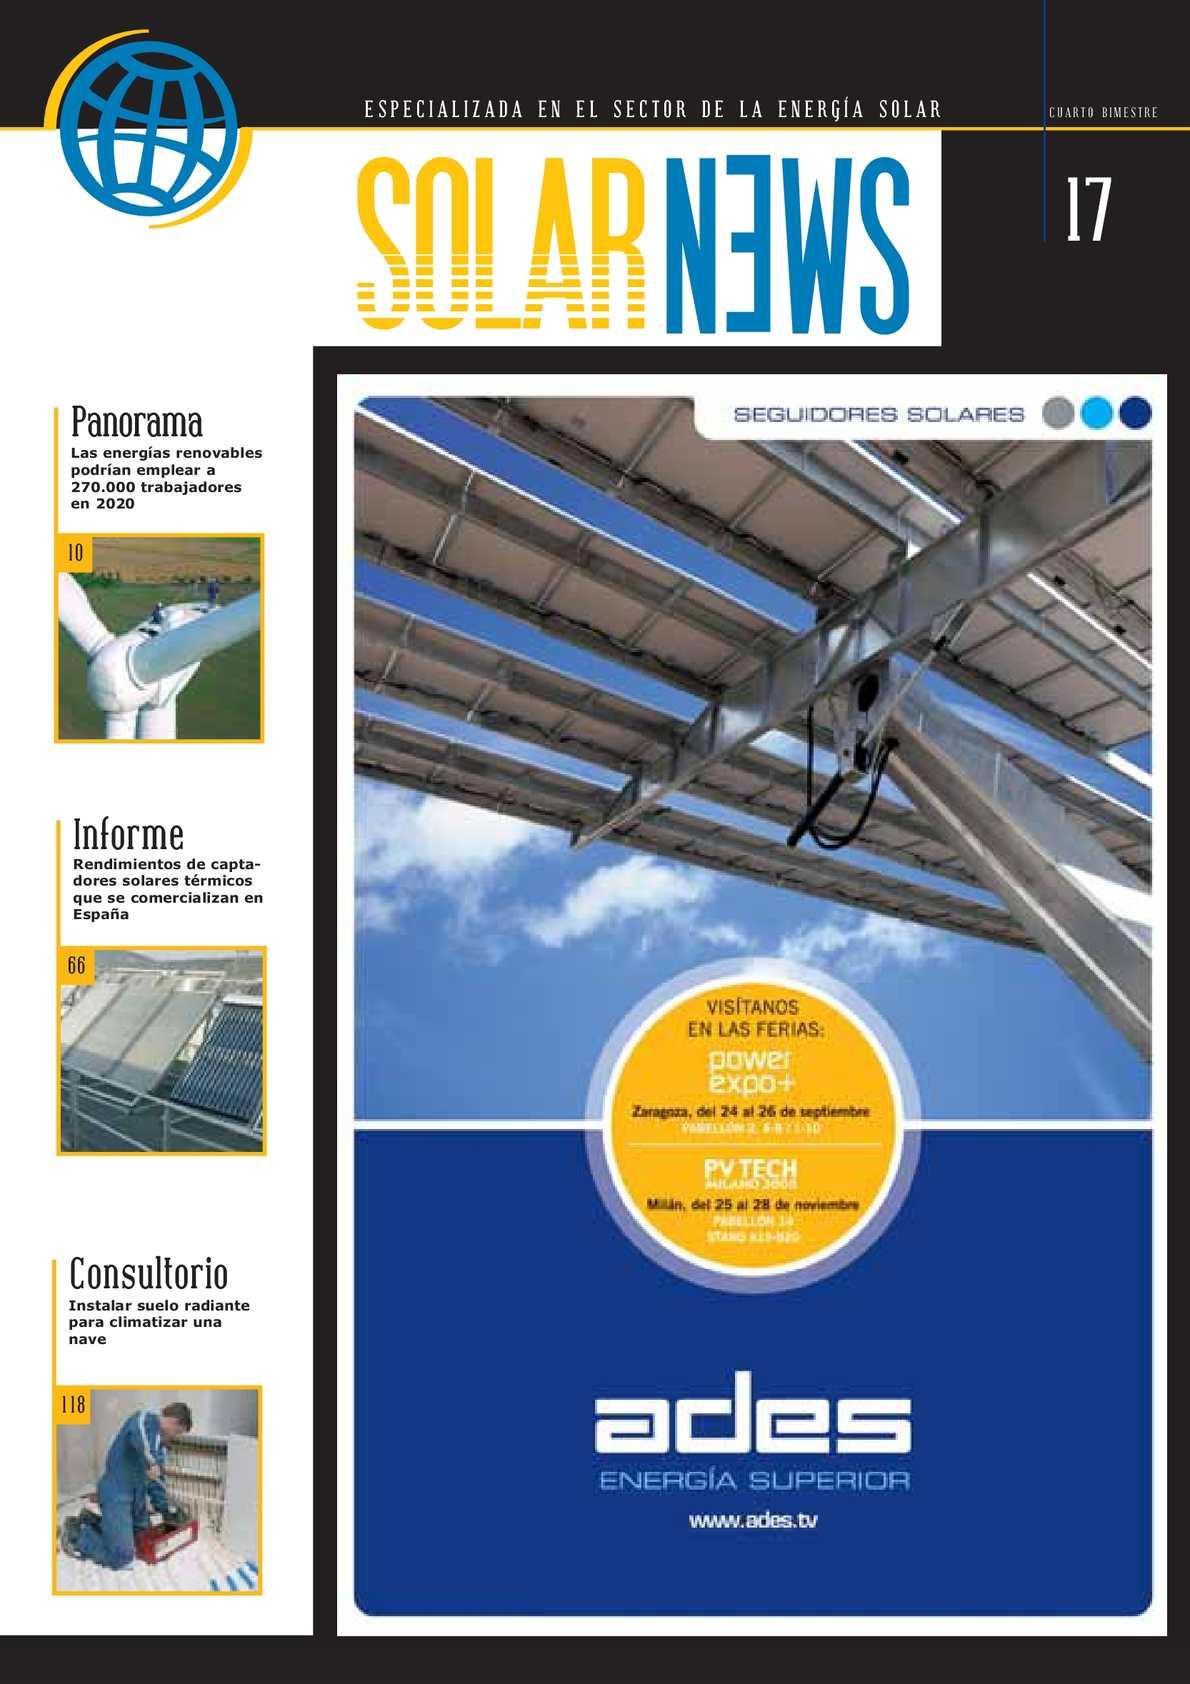 Calaméo Revista Solar News N17